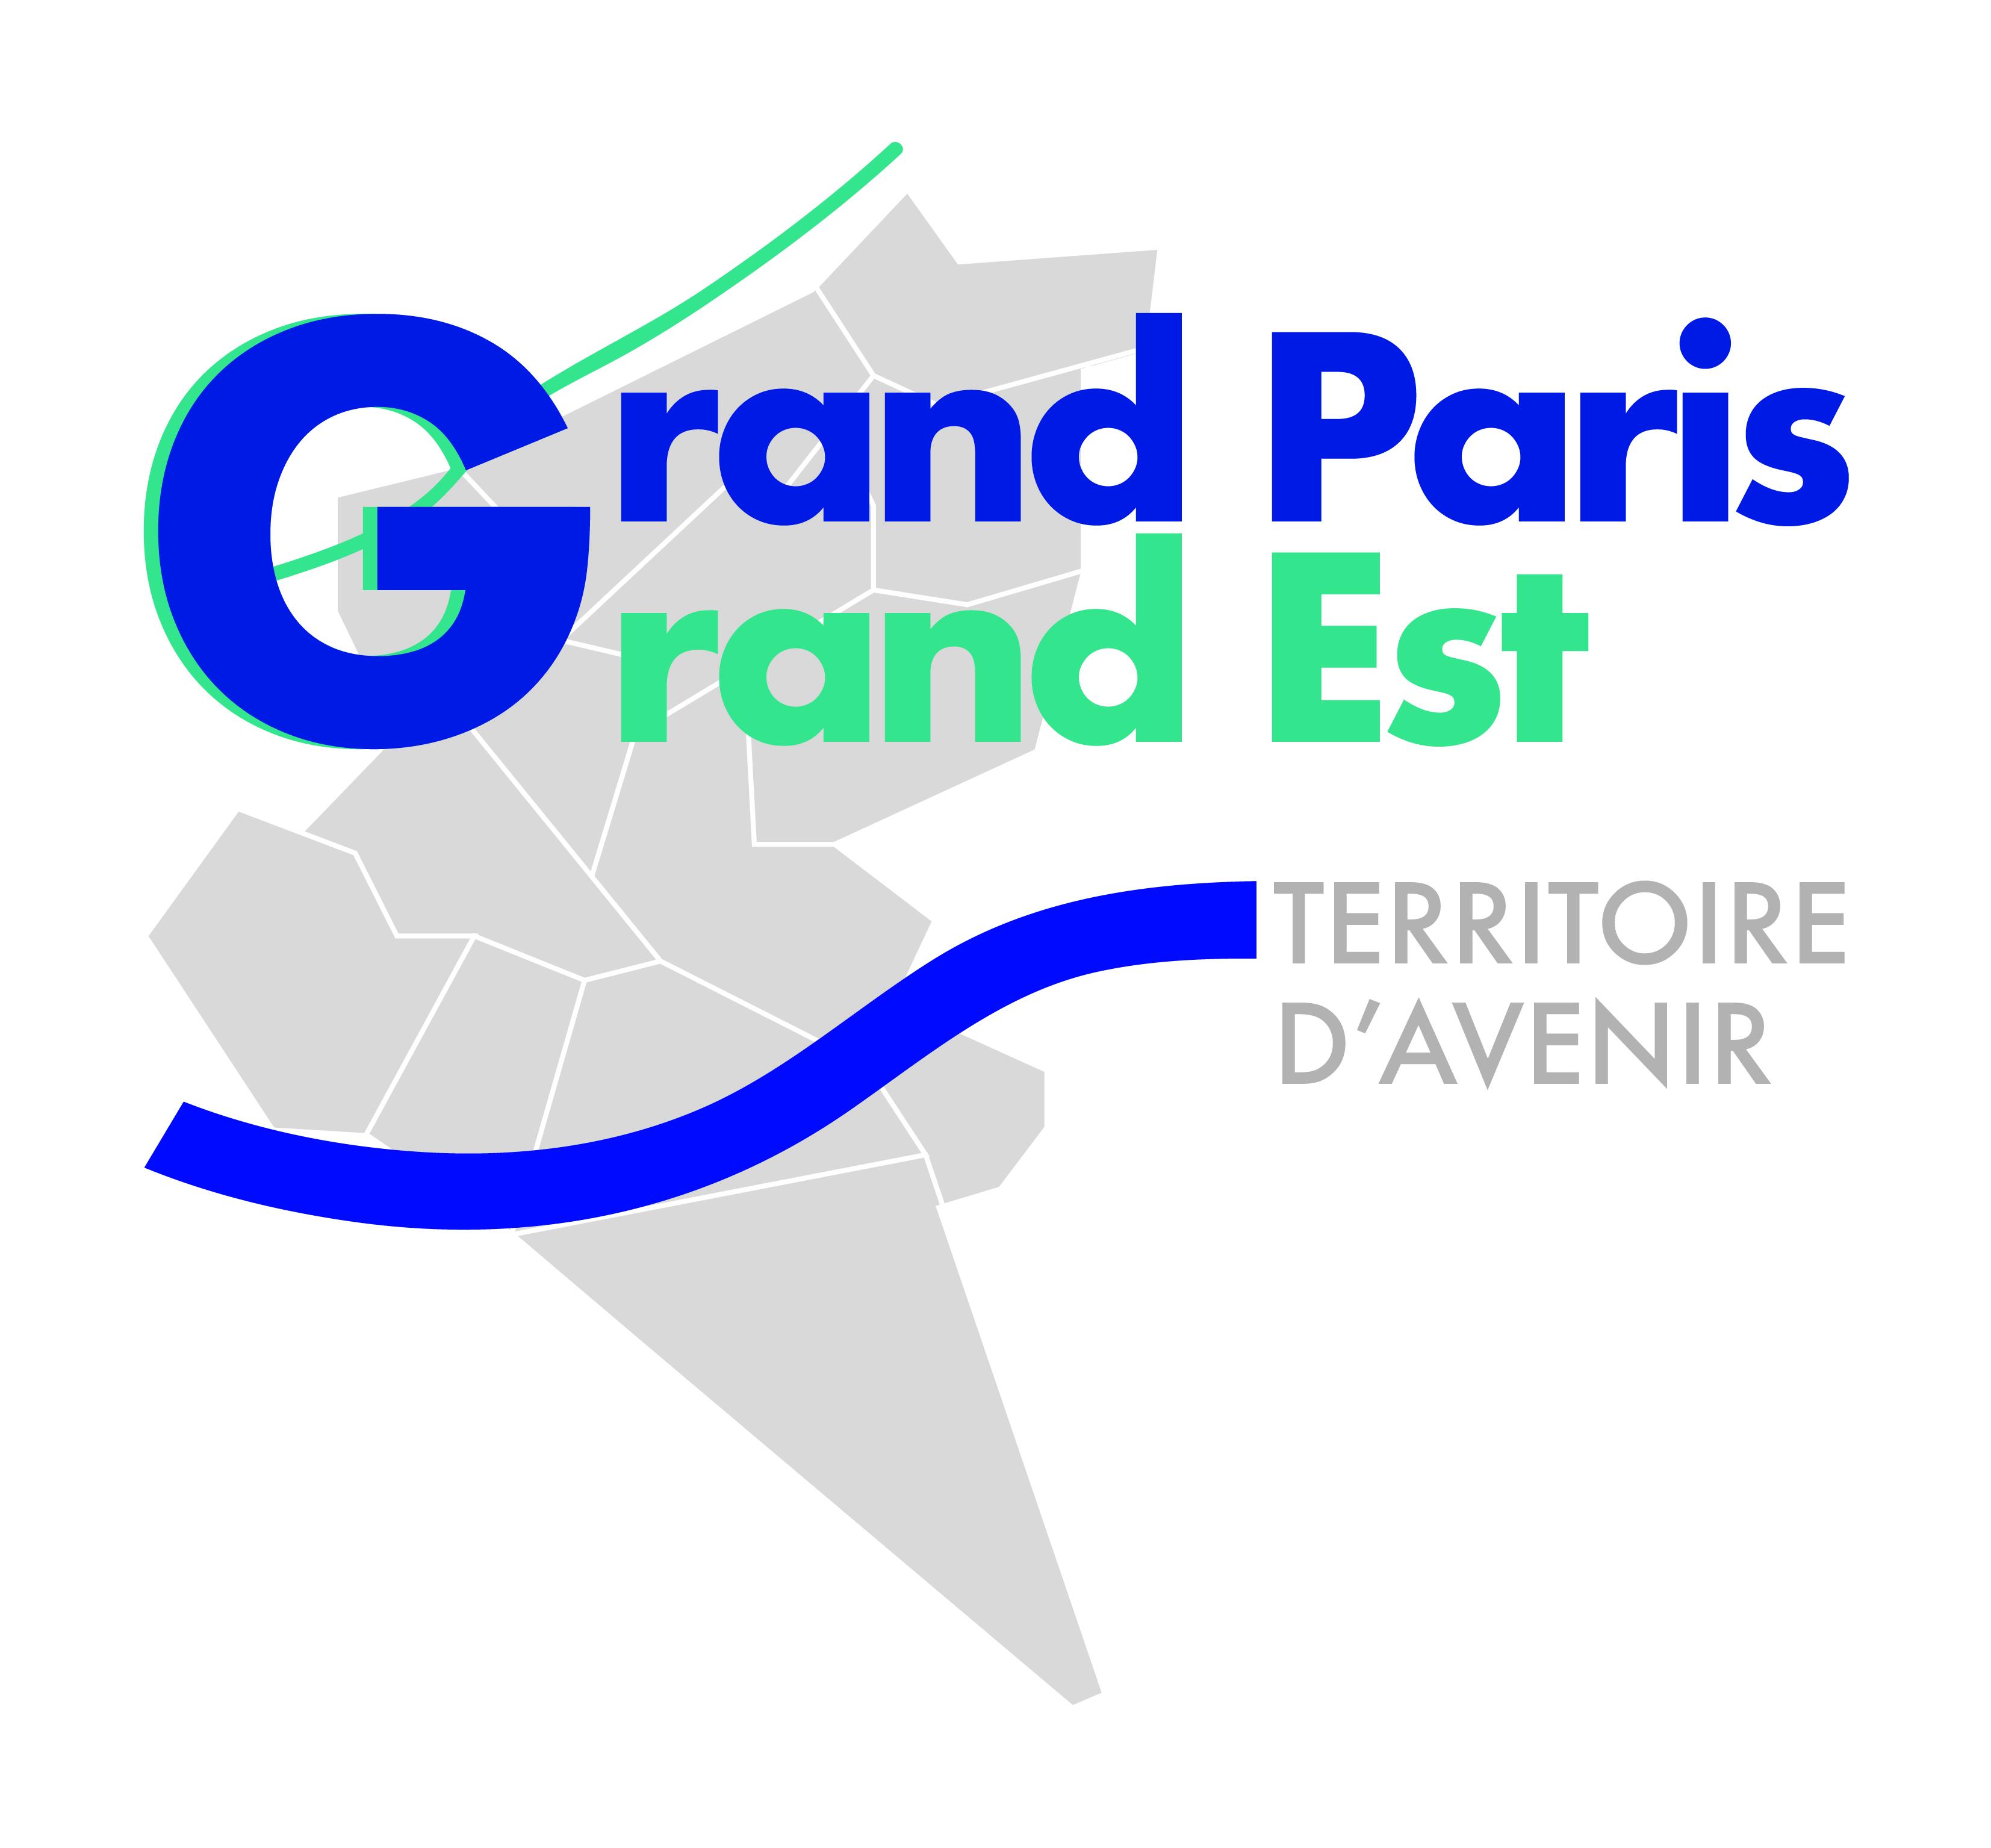 bc71eb69e10 Offre d emploi GRAND PARIS GRAND EST TERRITOIRE D AVENIR - Emploipublic